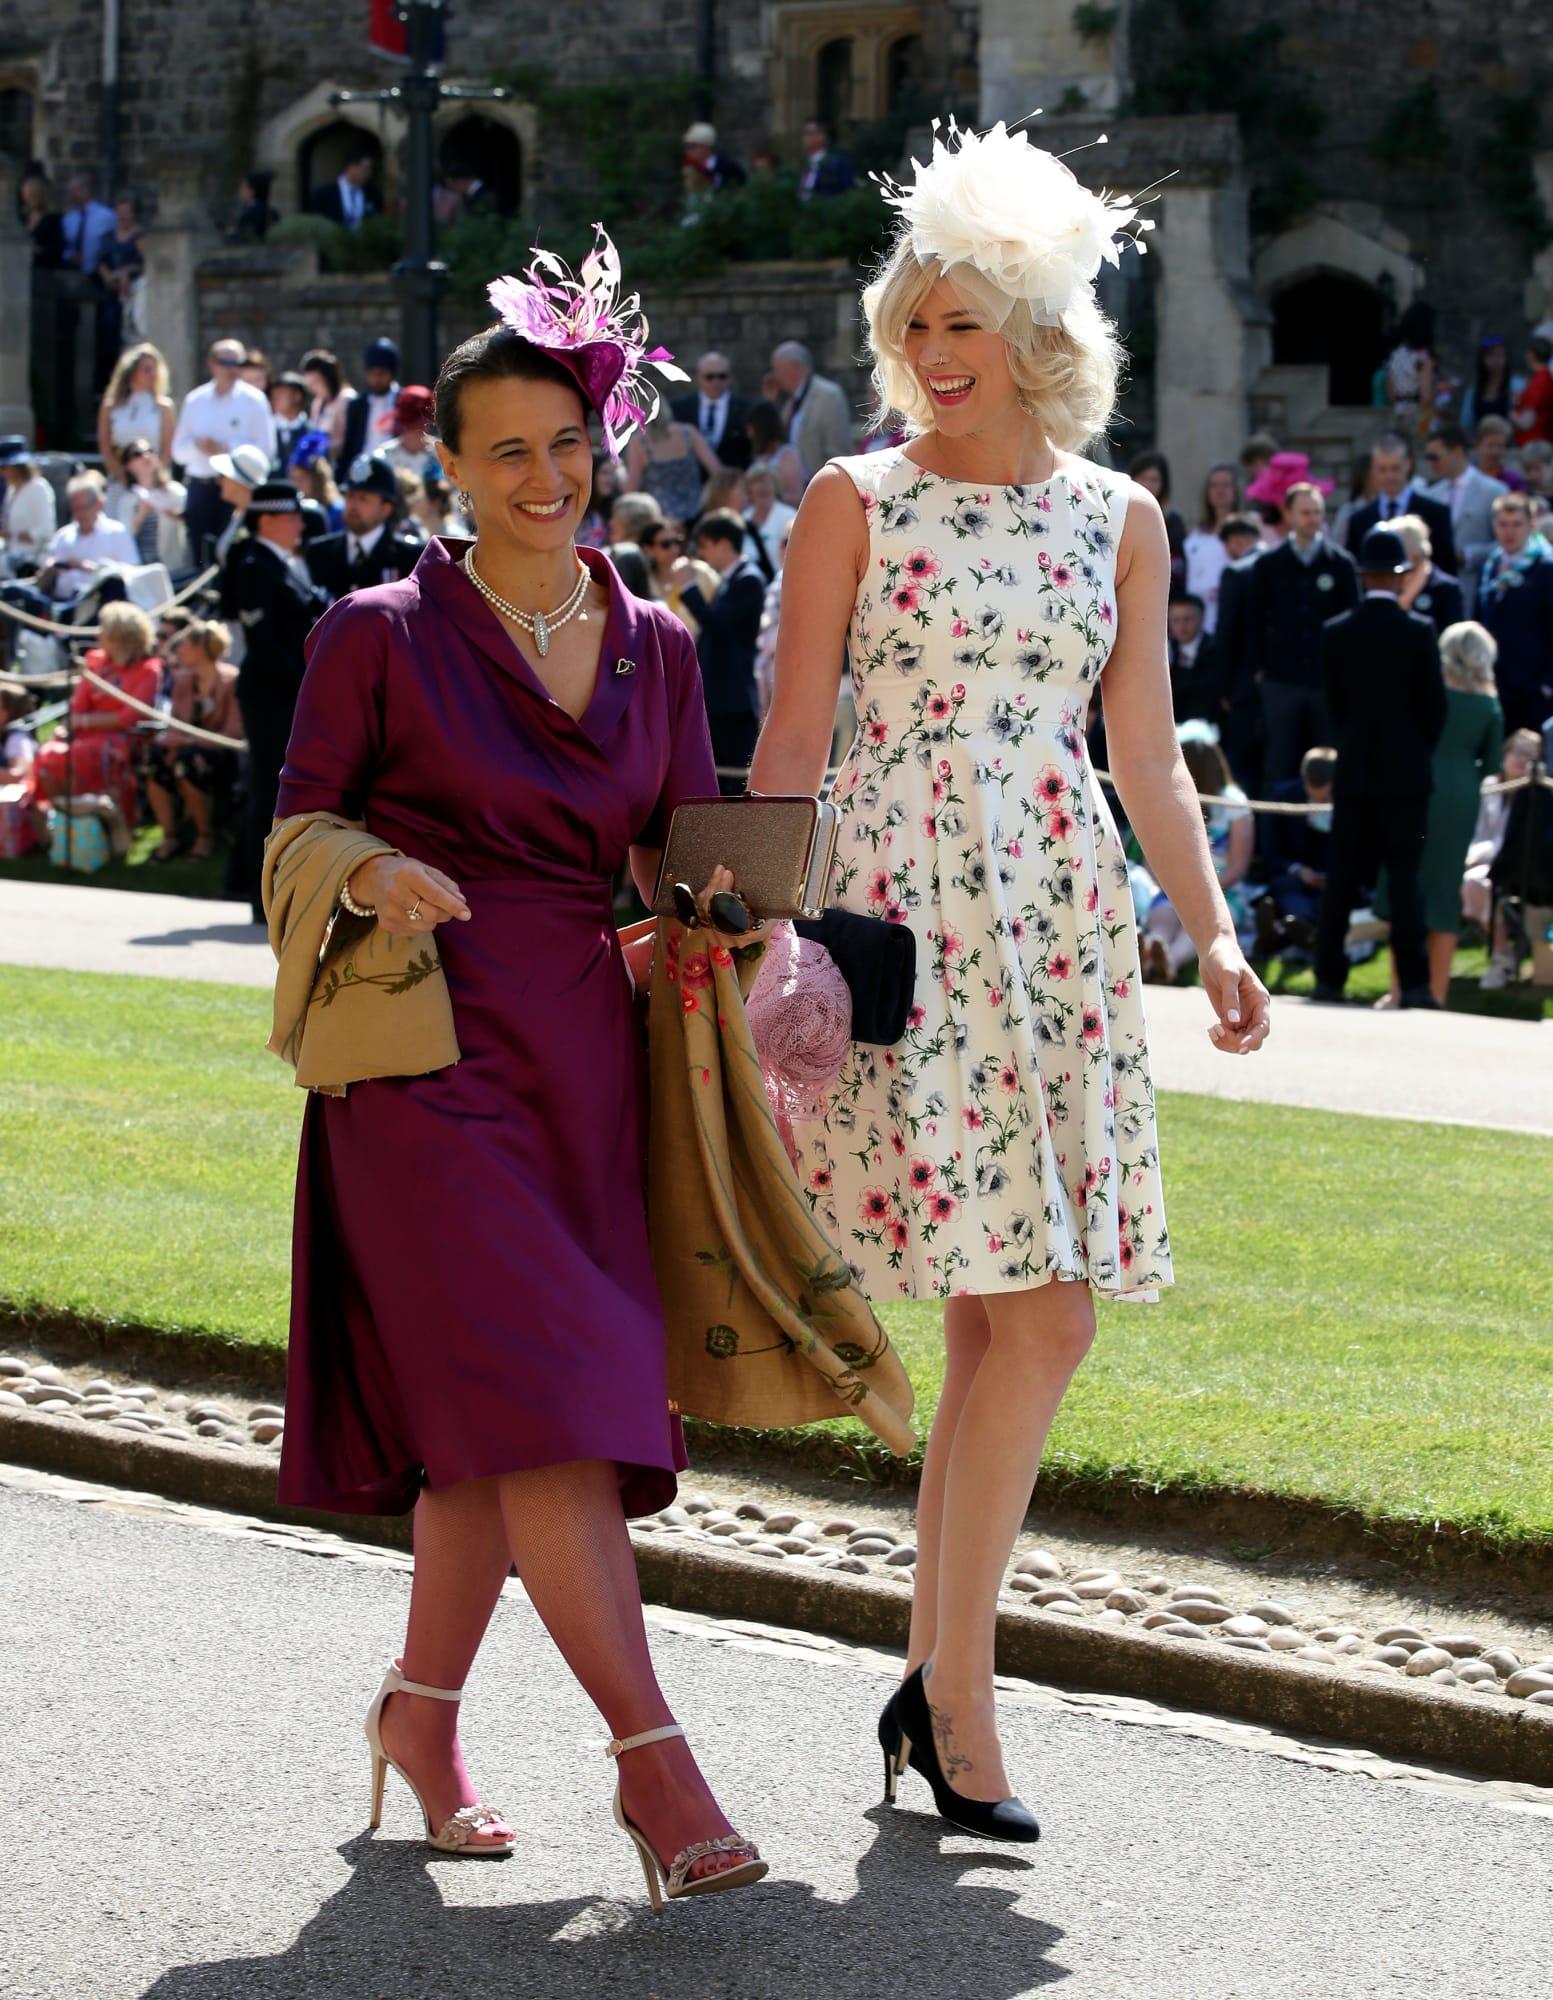 royal-wedding-guests-2.jpg